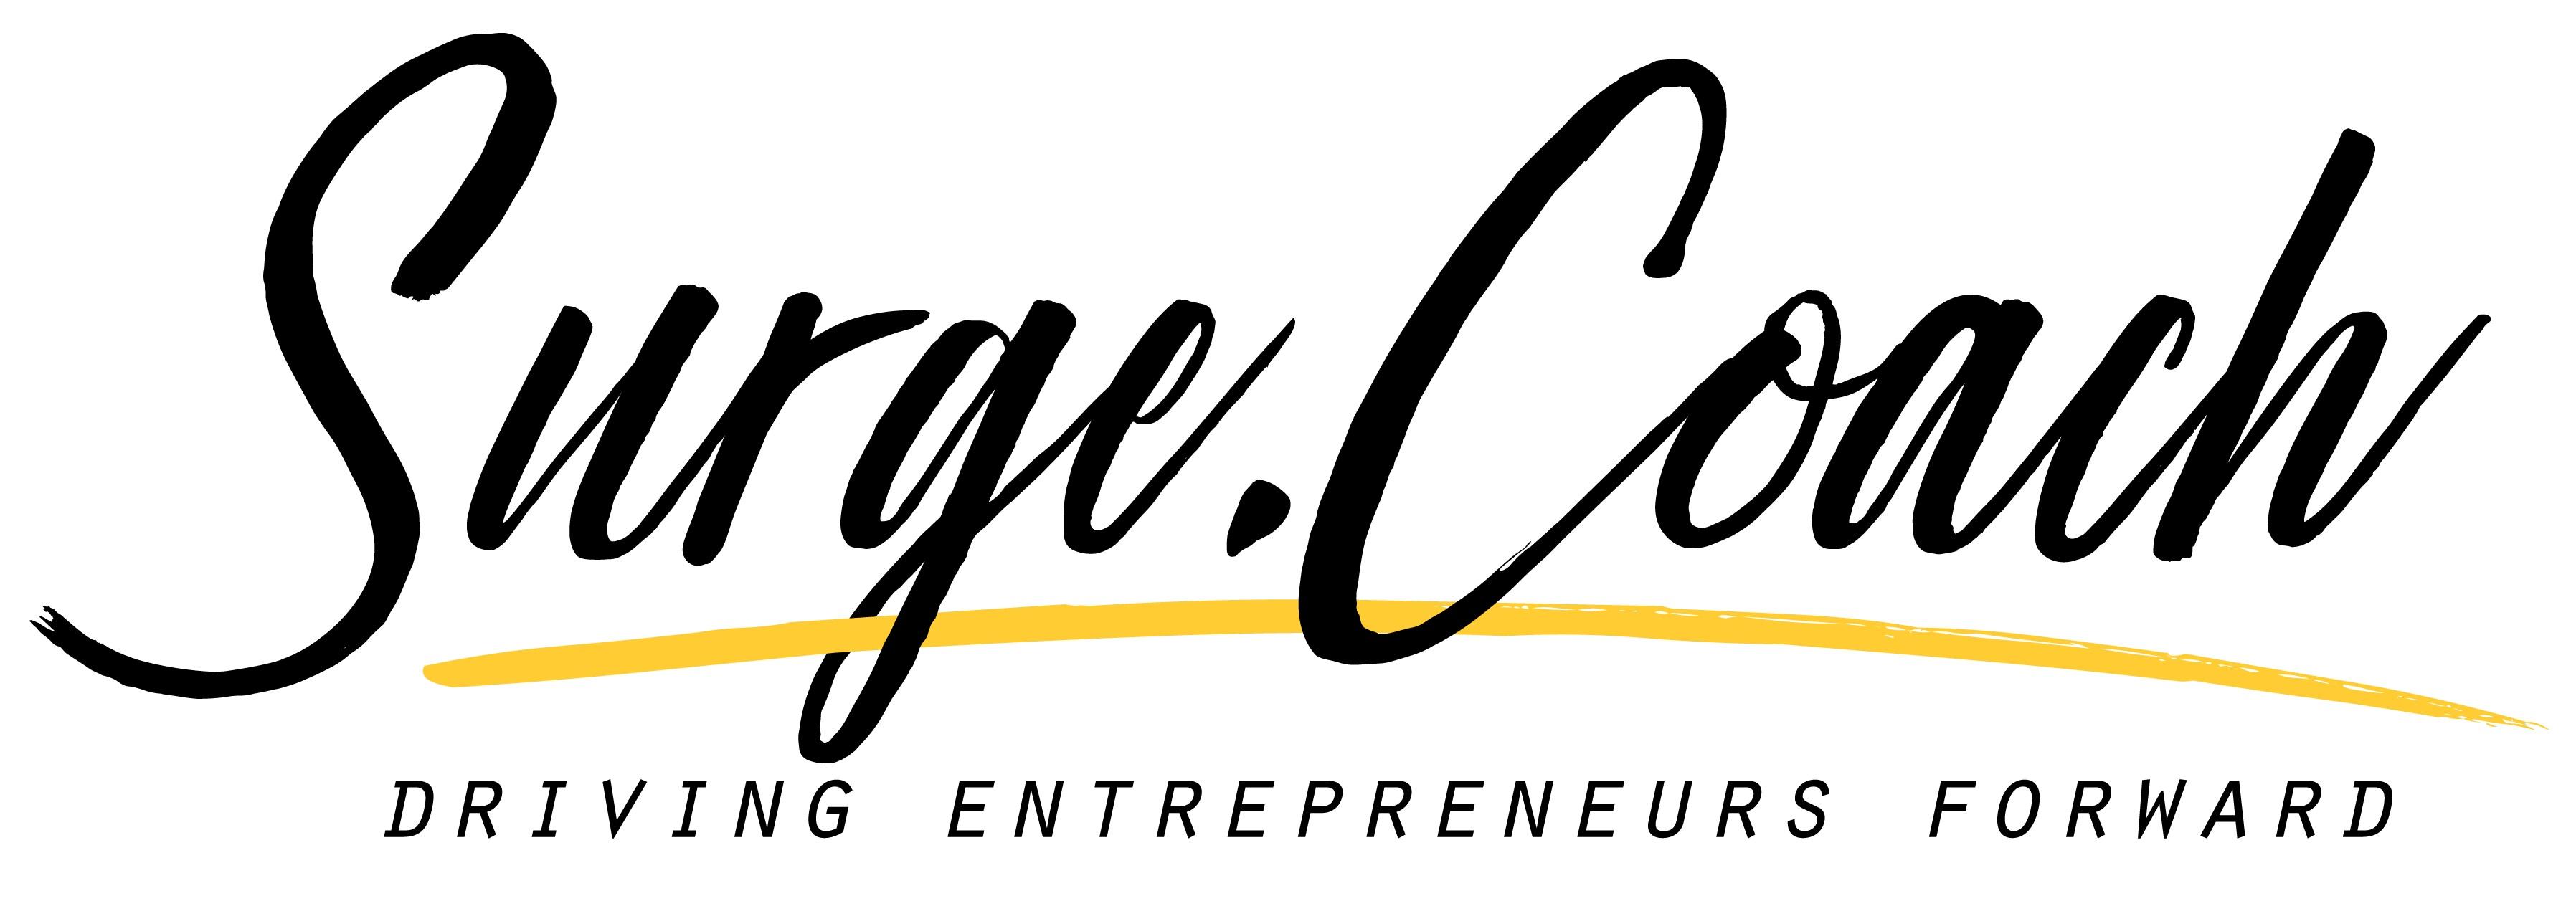 Surge Coach logo